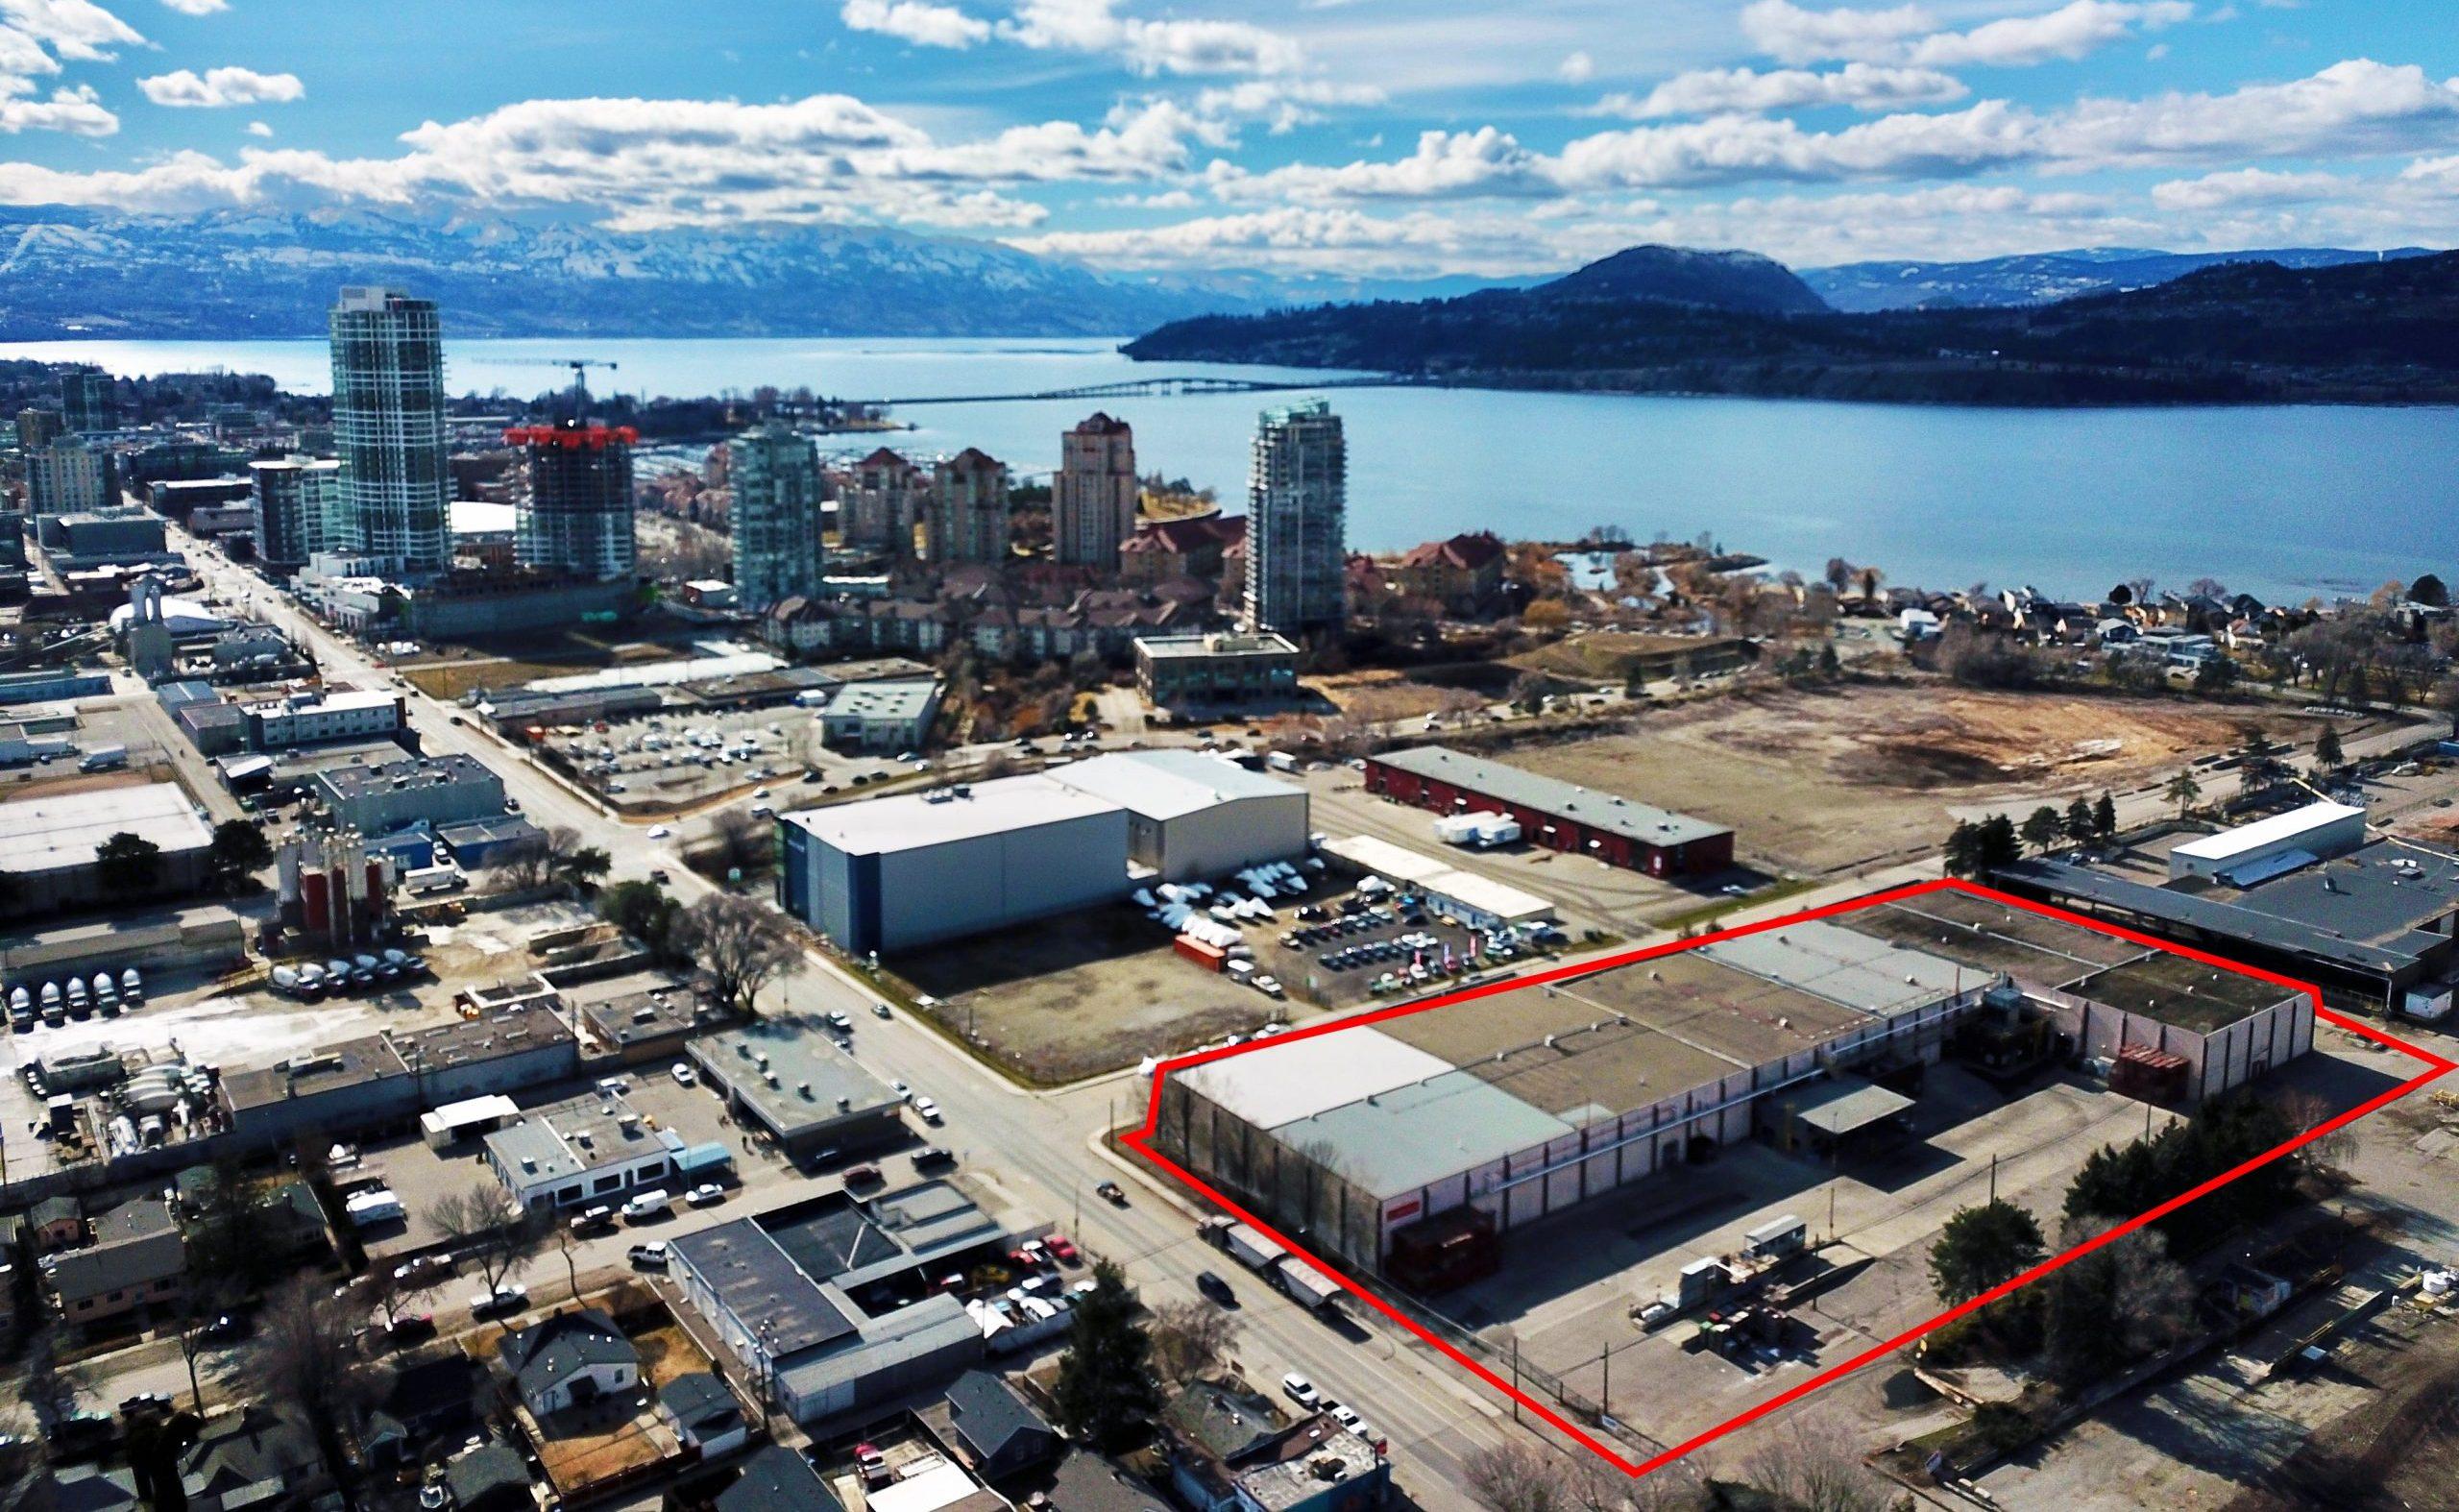 858 Ellis Street & 399 Bay Avenue, Kelowna, BC - Downtown Kelowna Industrial Property with Redevelopment Potential